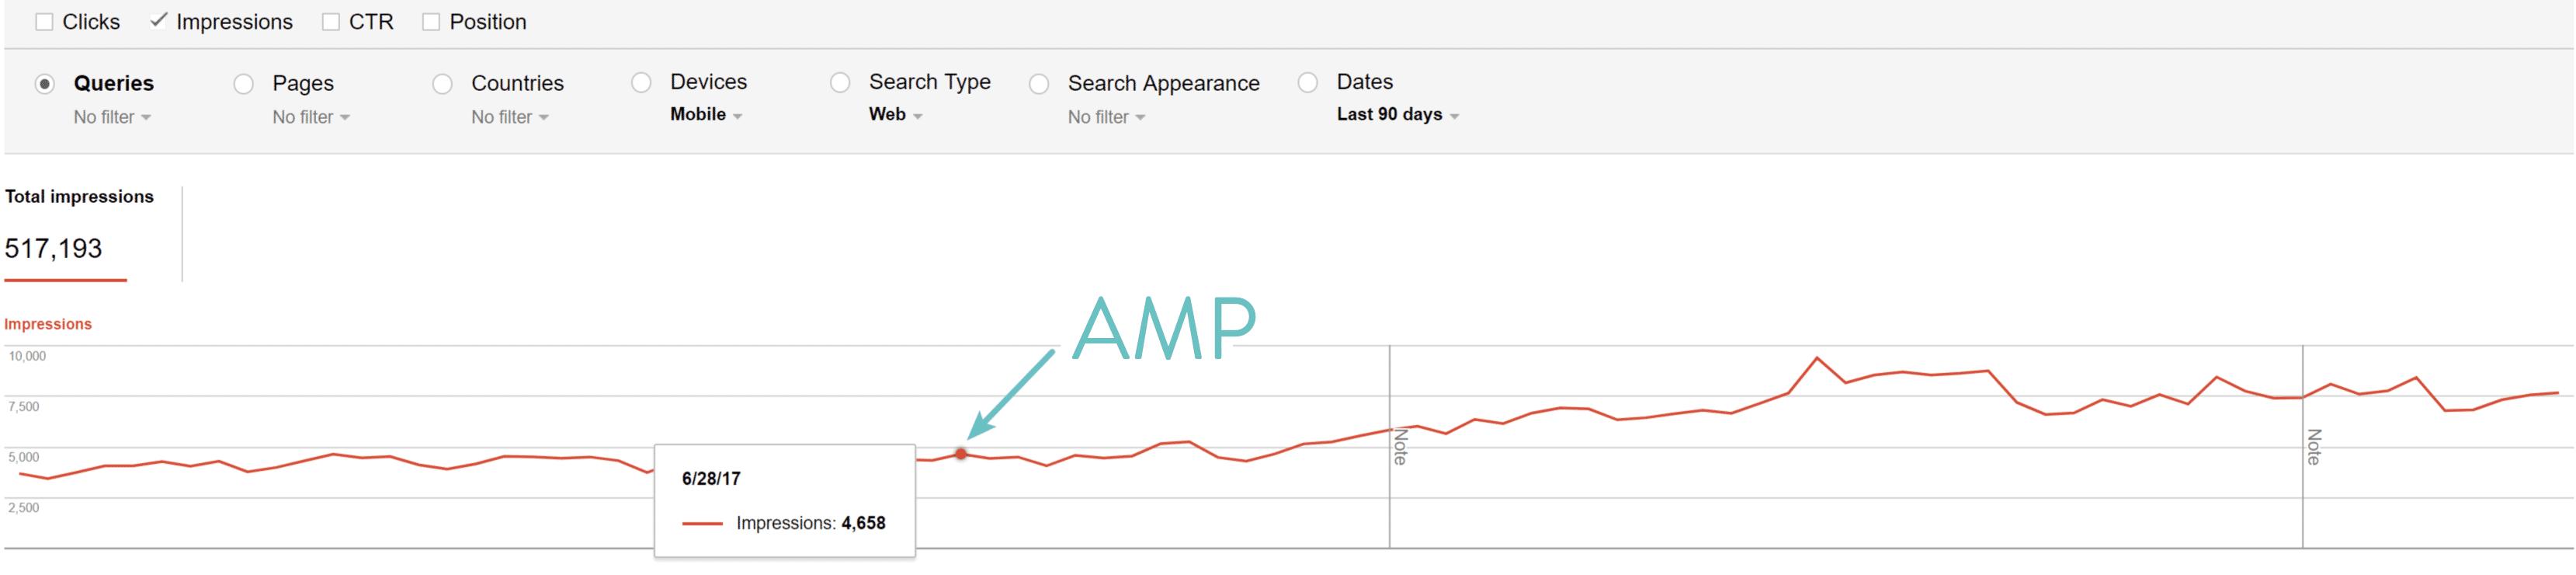 Google AMP-visningar